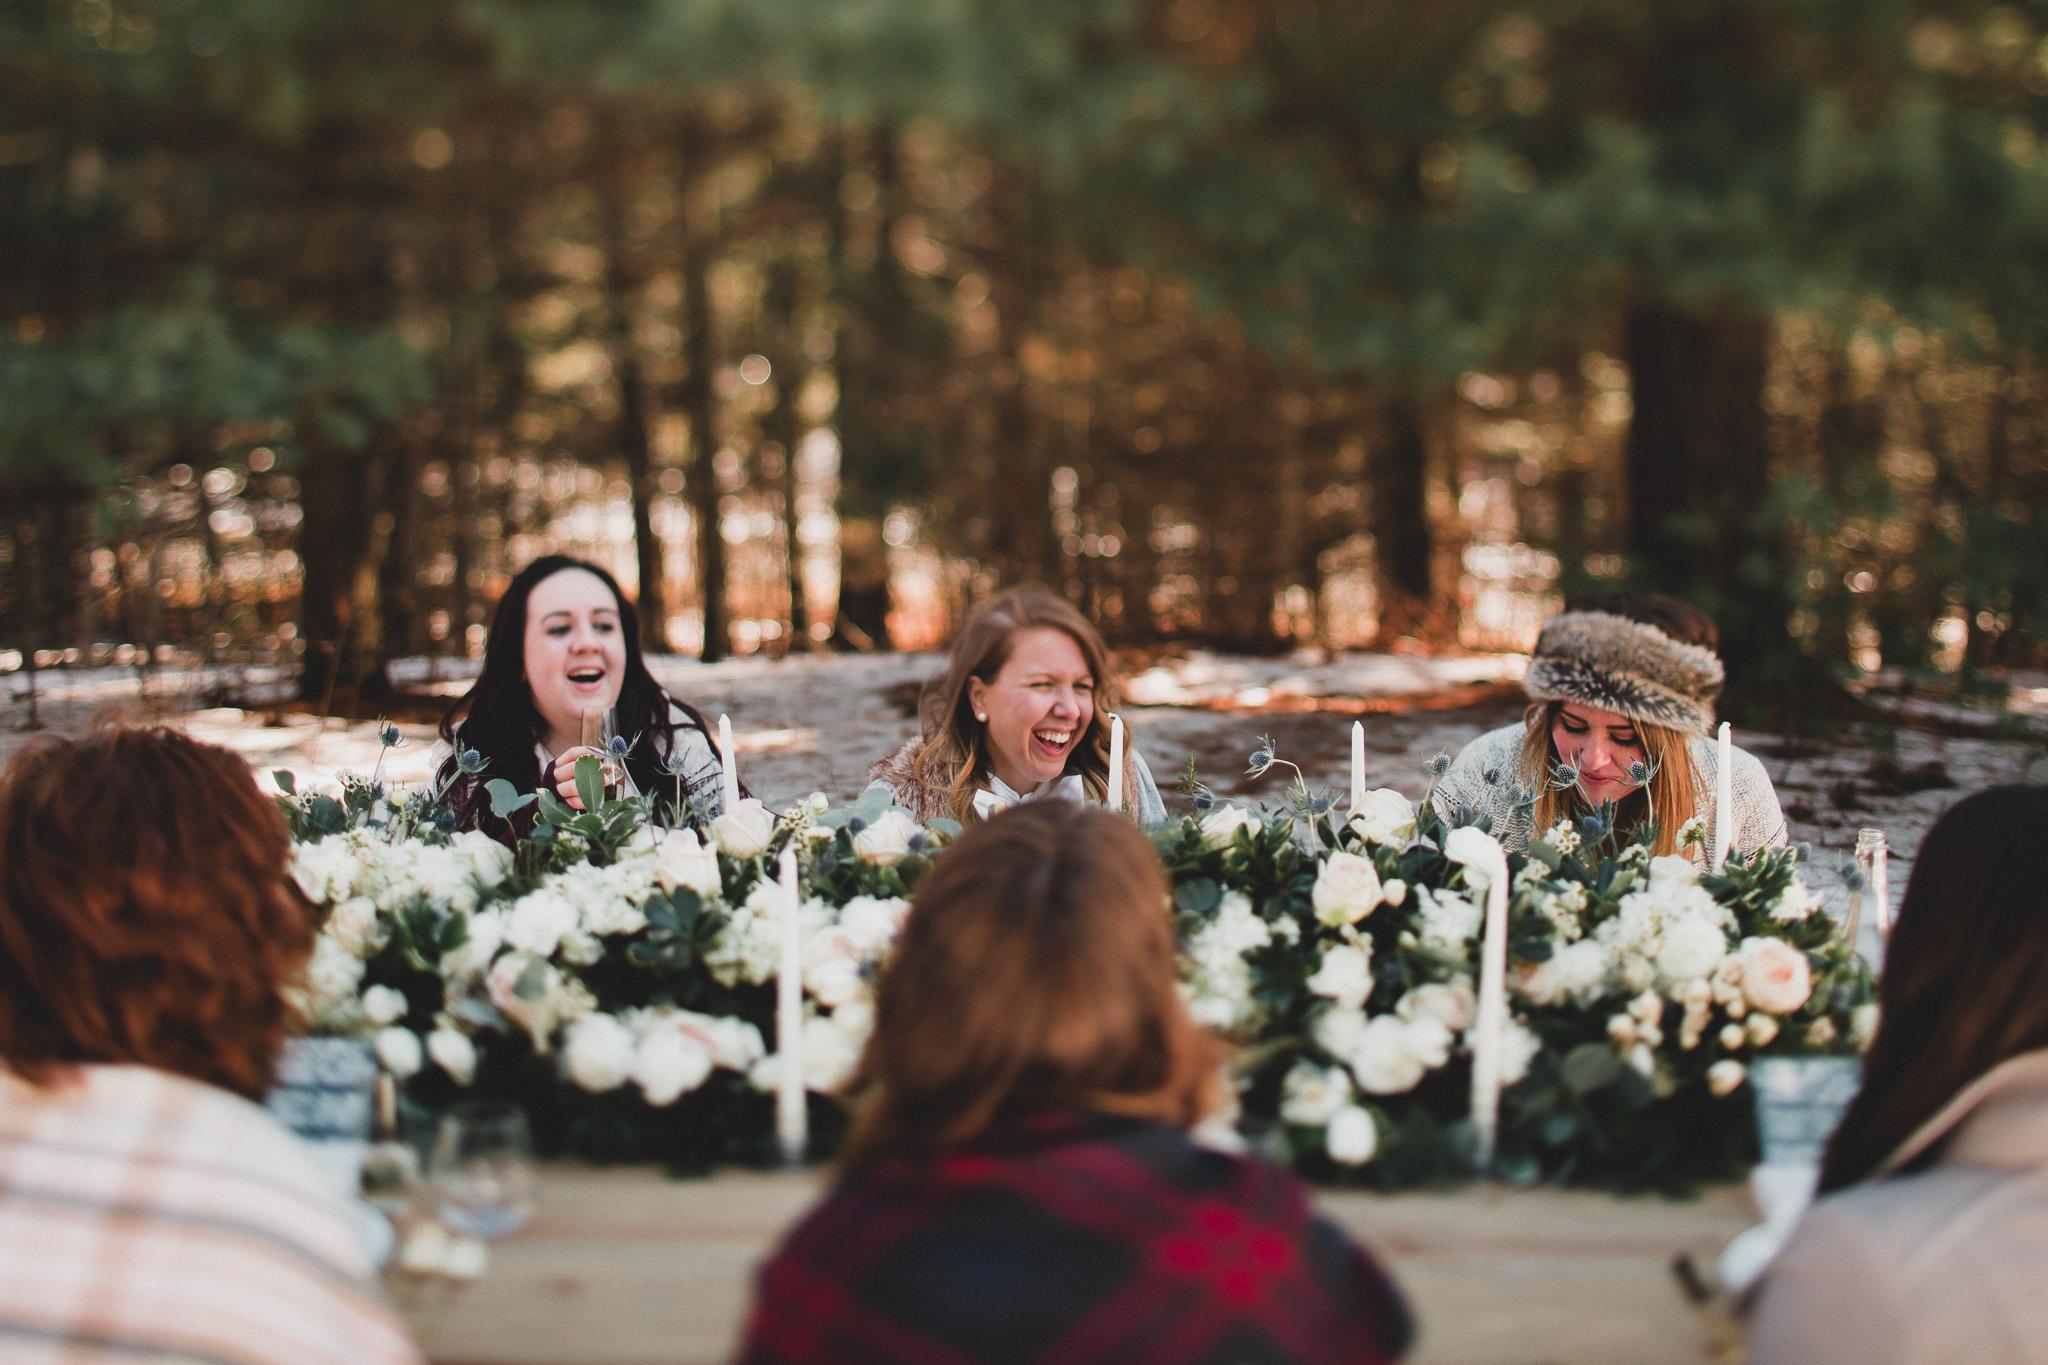 Natural and candid wedding photograph Perth